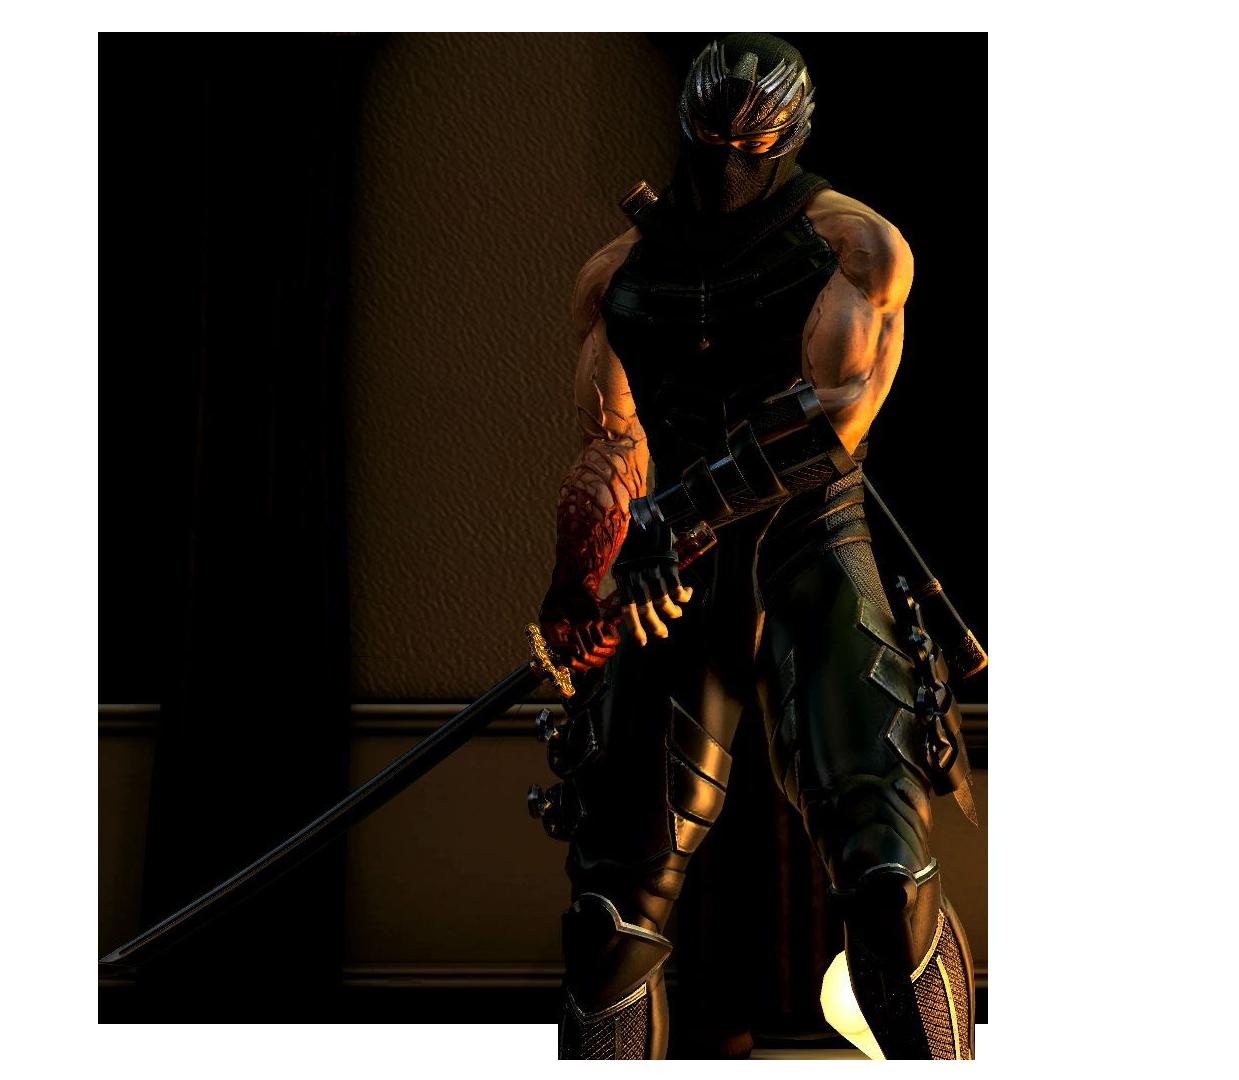 Ninja Gaiden 3 Screenshot Render By The Blacklisted On Deviantart